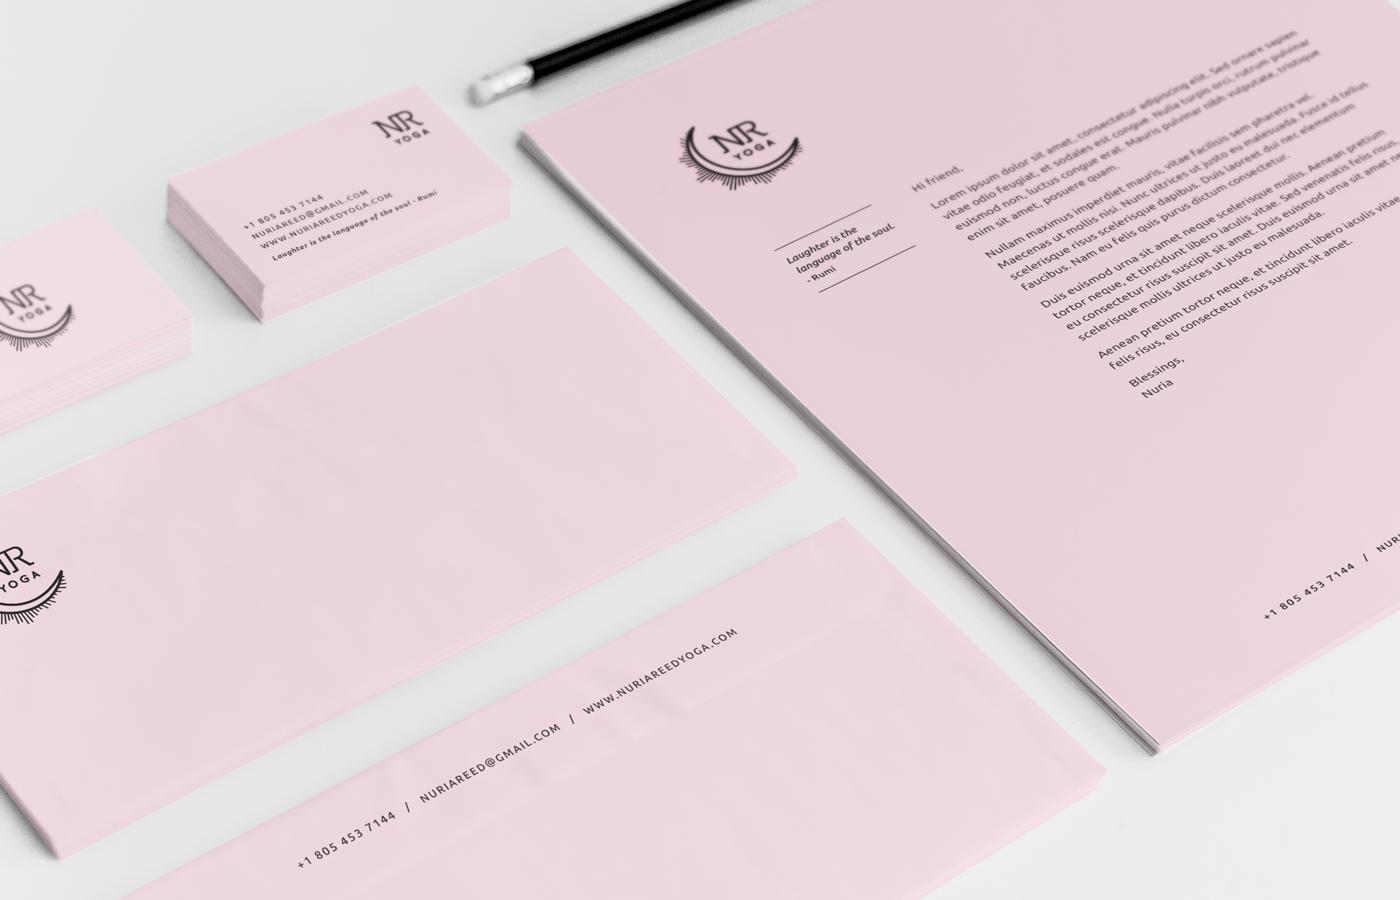 nuria reed yoga, identity package, brand, pink, black, moon